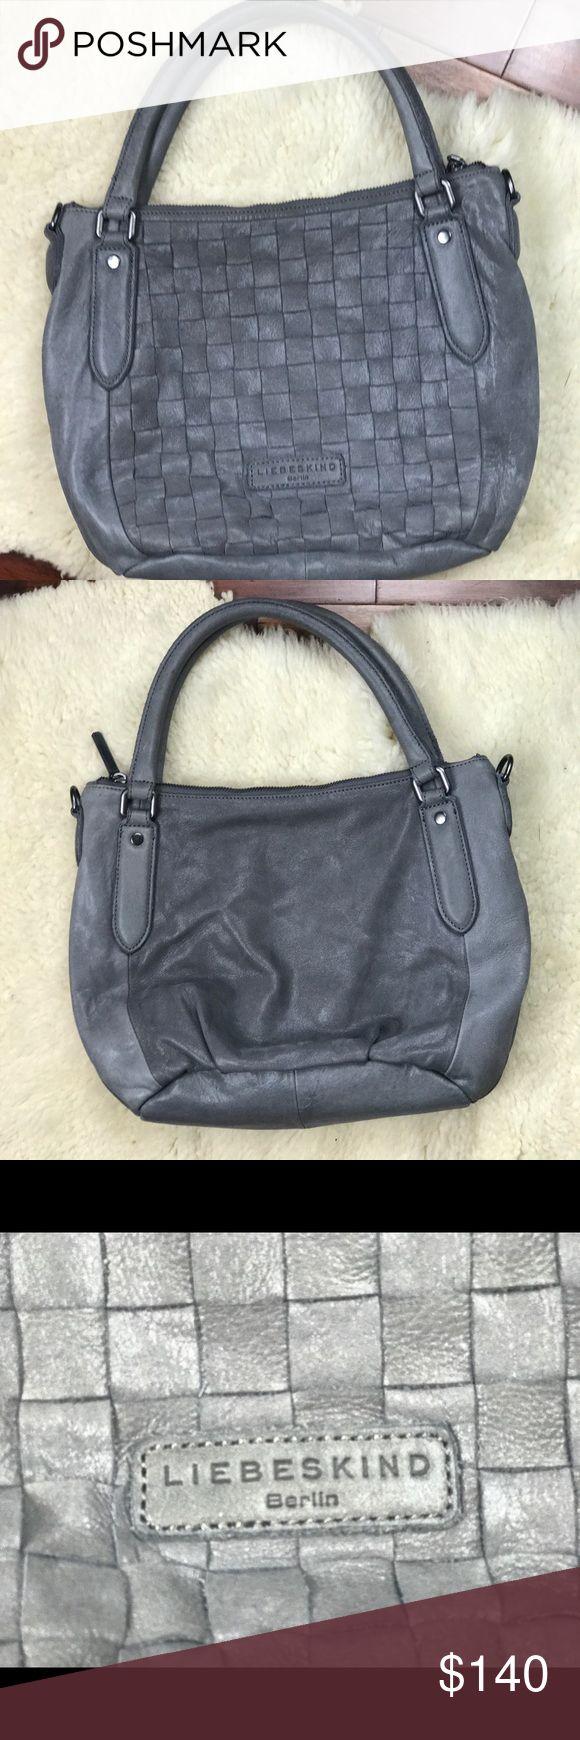 ♻️ Liebeskind Berlin Premium leather handbag Liebeskind Medium-Sized Bag. Excellent Condition. Multiple Pockets Inside The Bag And One Large Zippered Pocket. Liebeskind Bags Satchels